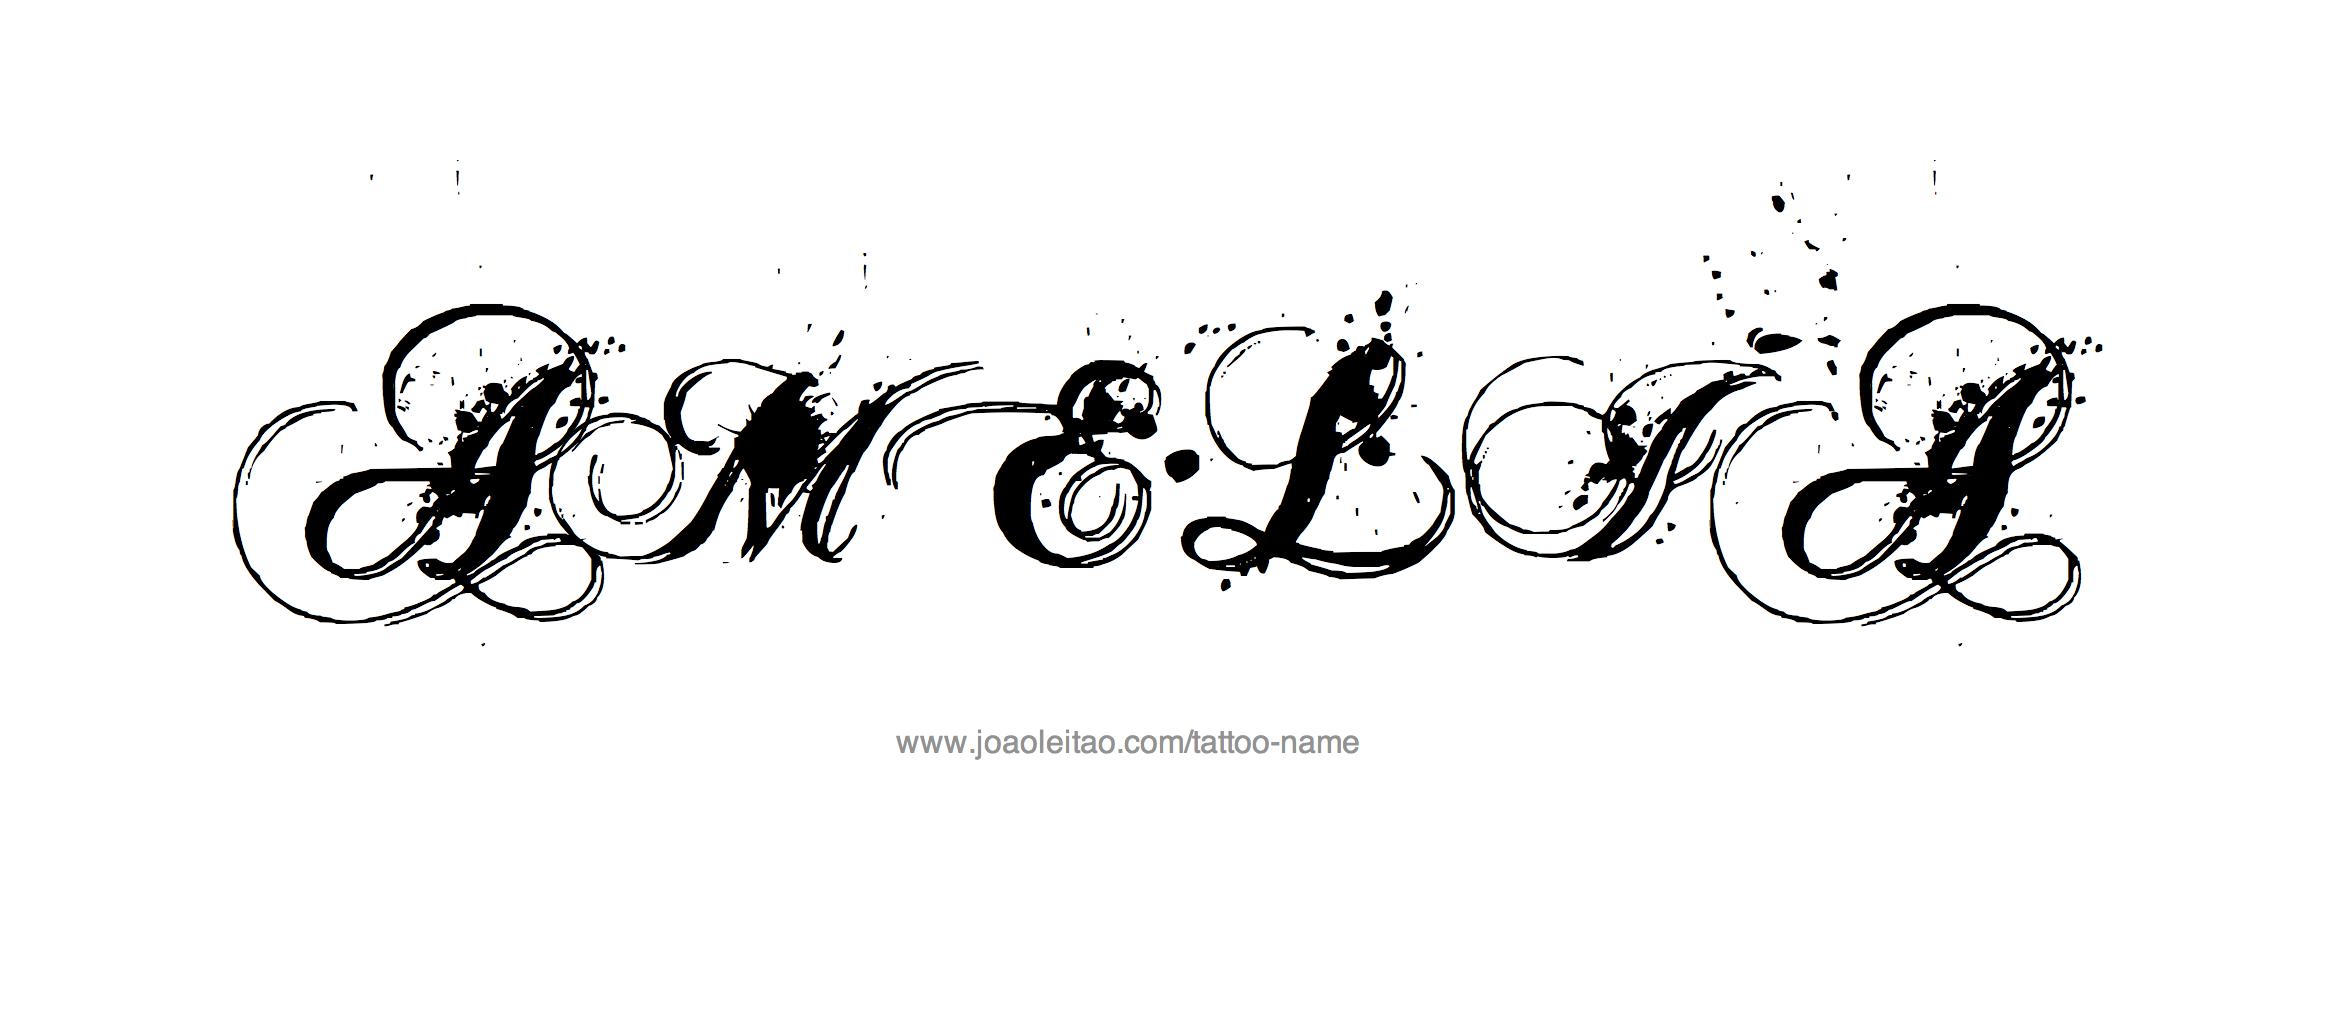 amelia name tattoo designs. Black Bedroom Furniture Sets. Home Design Ideas